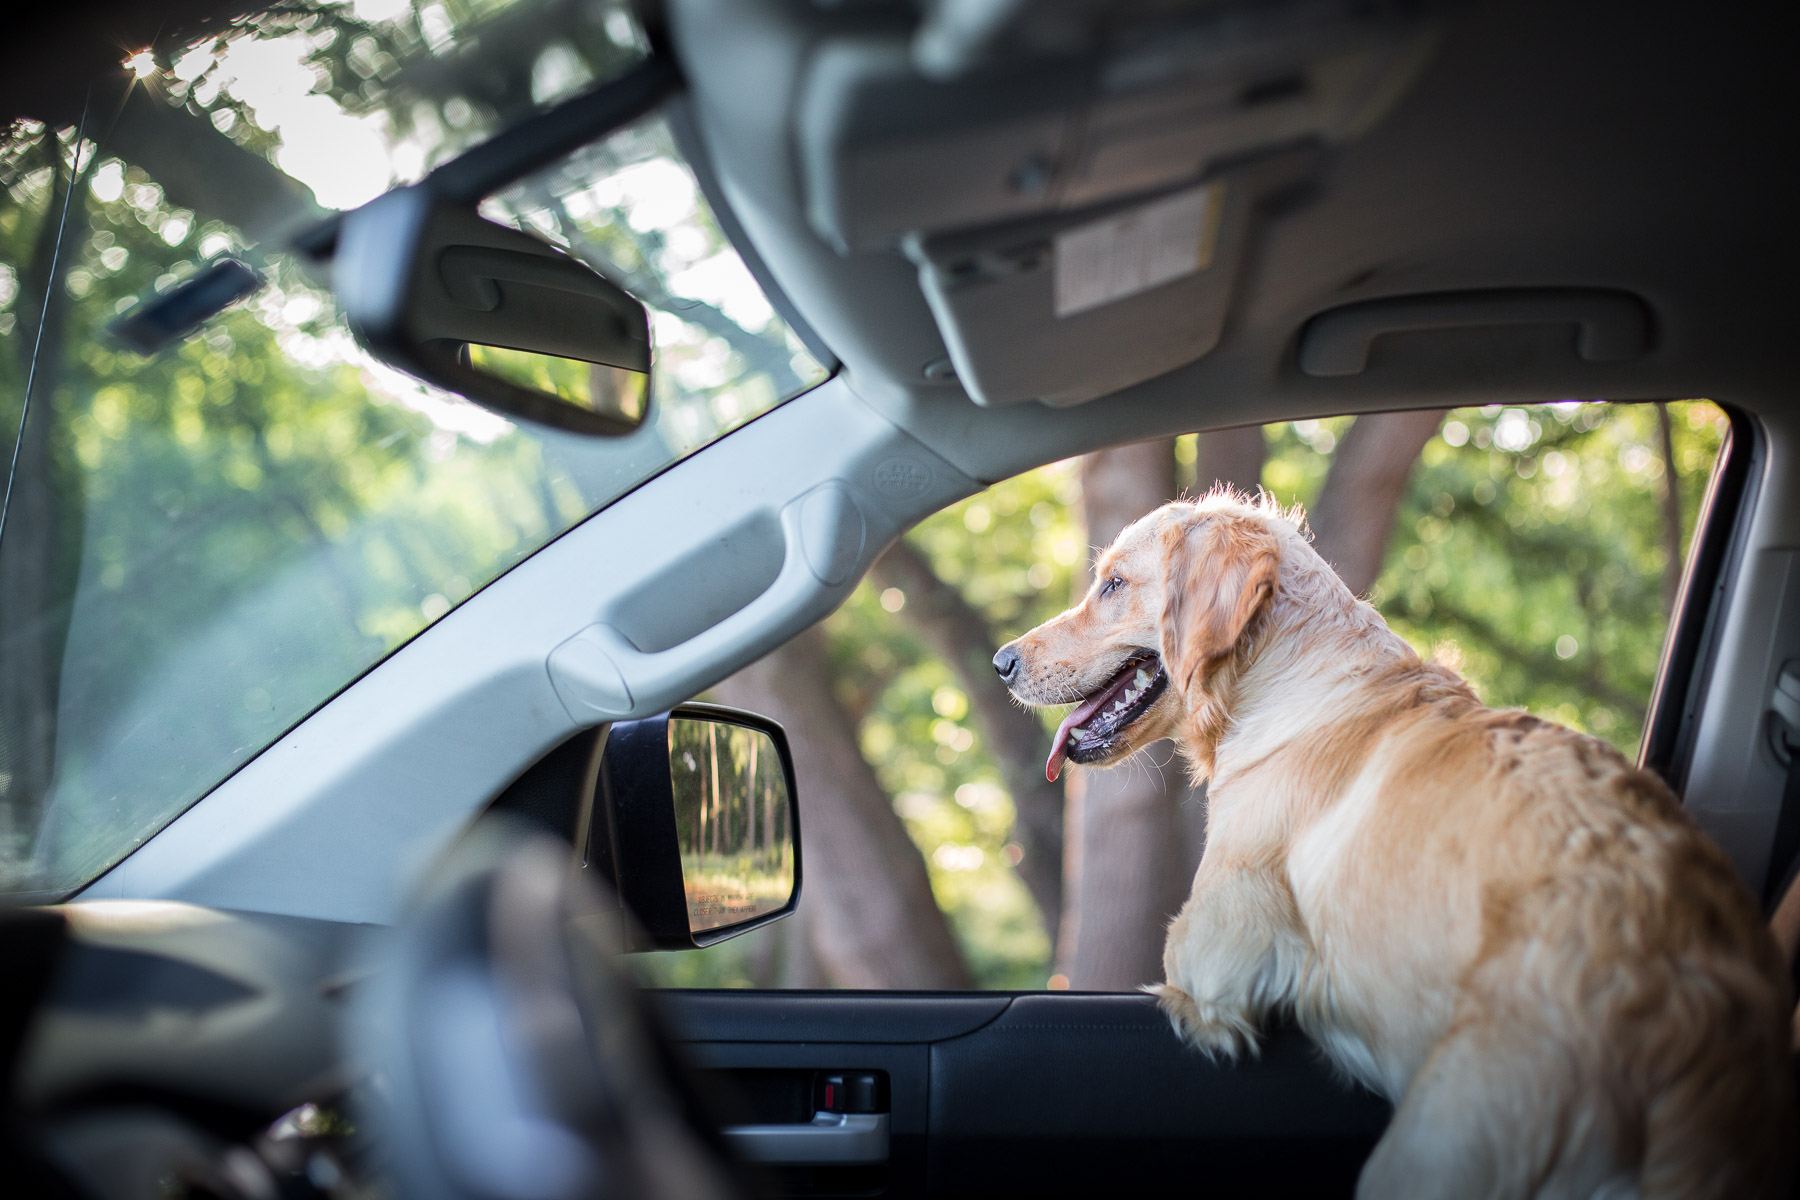 dog-golden-retriever-puppy-looking-out-car-window.jpg